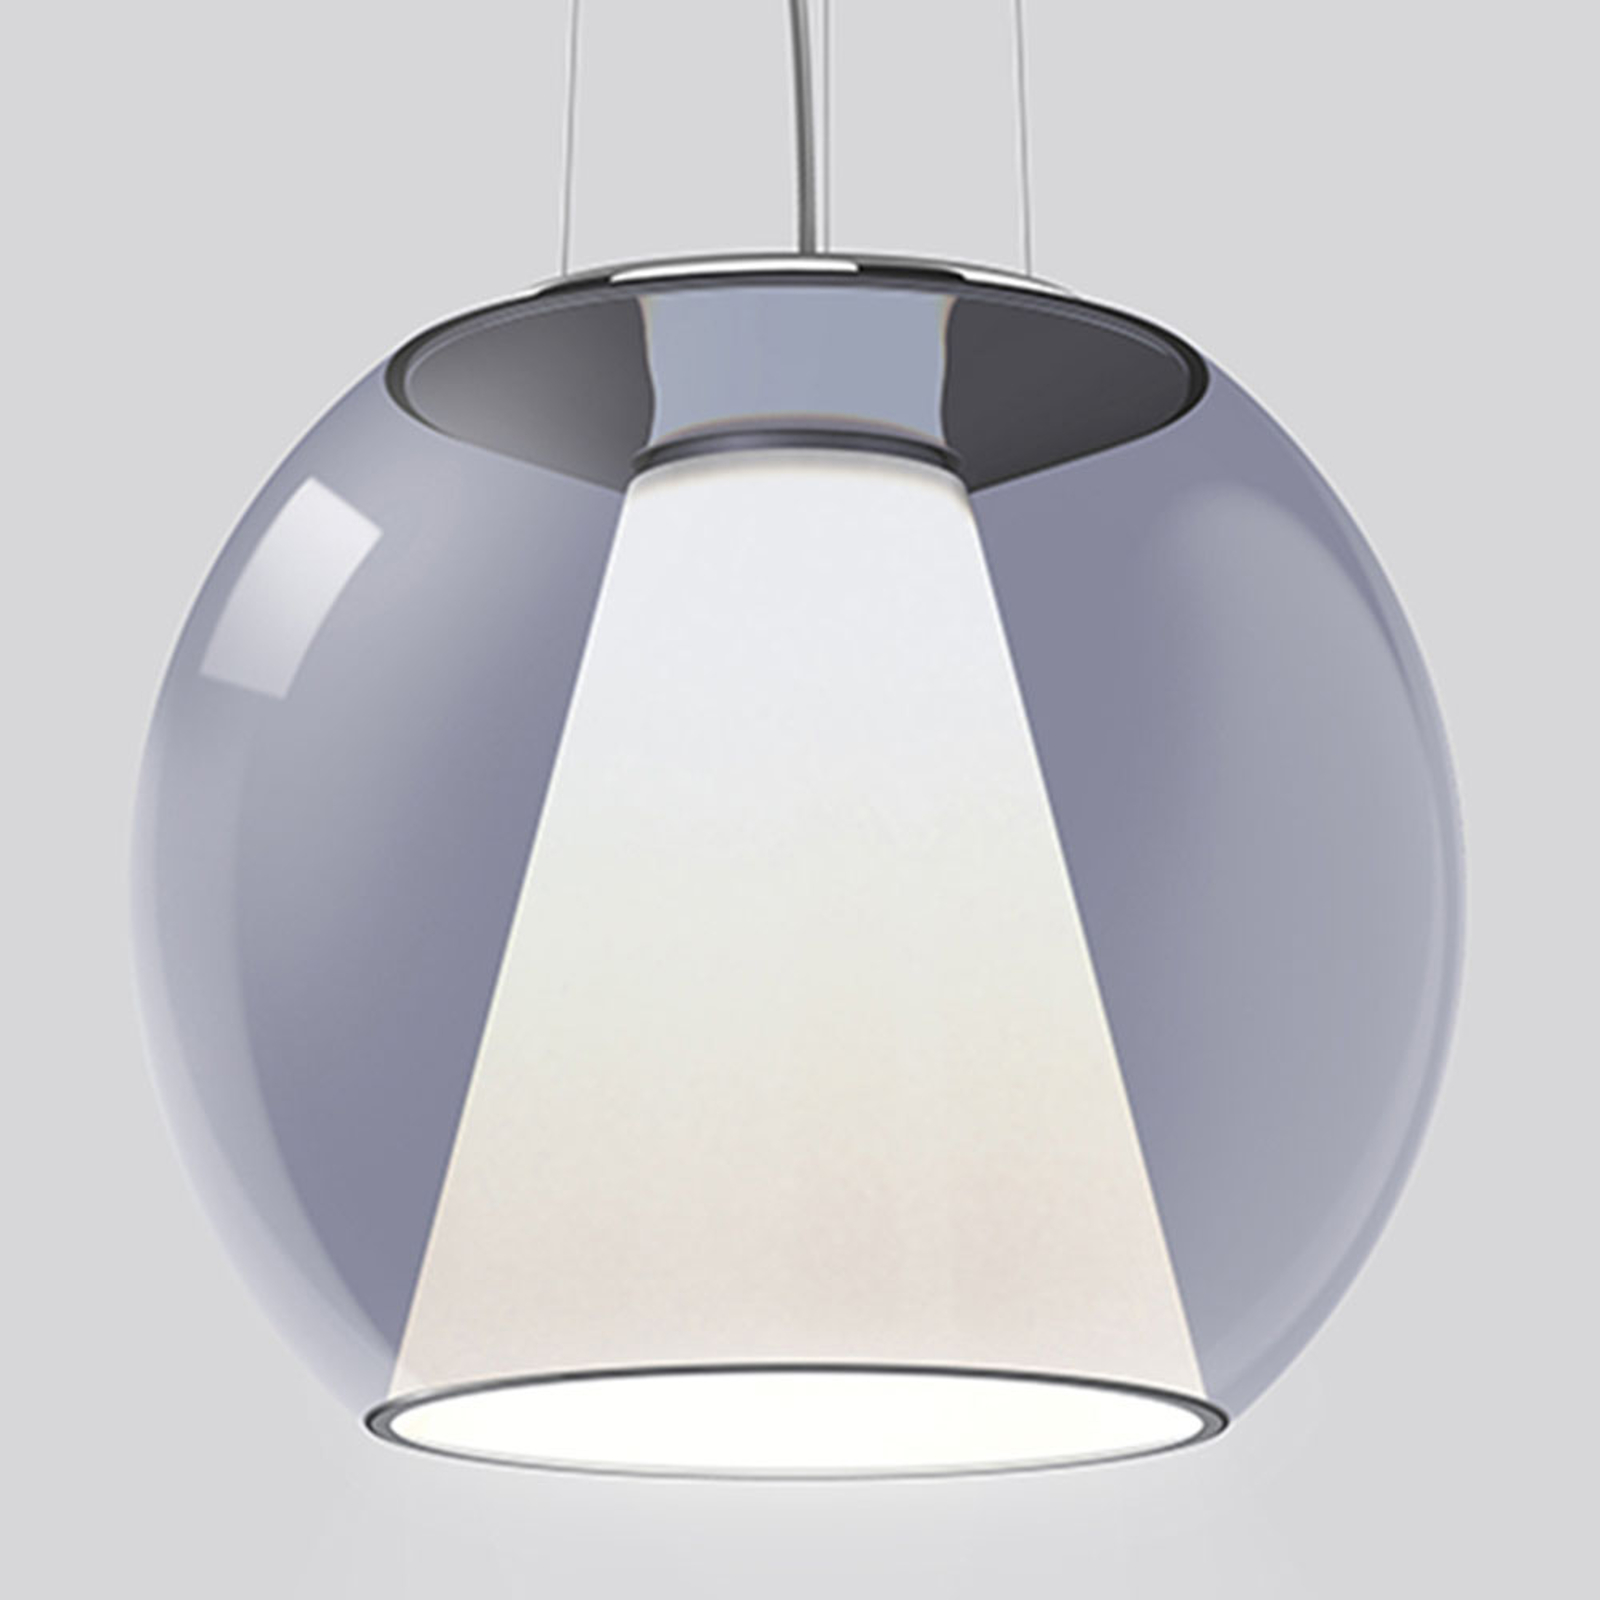 serien.lighting Draft M Hängelampe 927 Triac blau